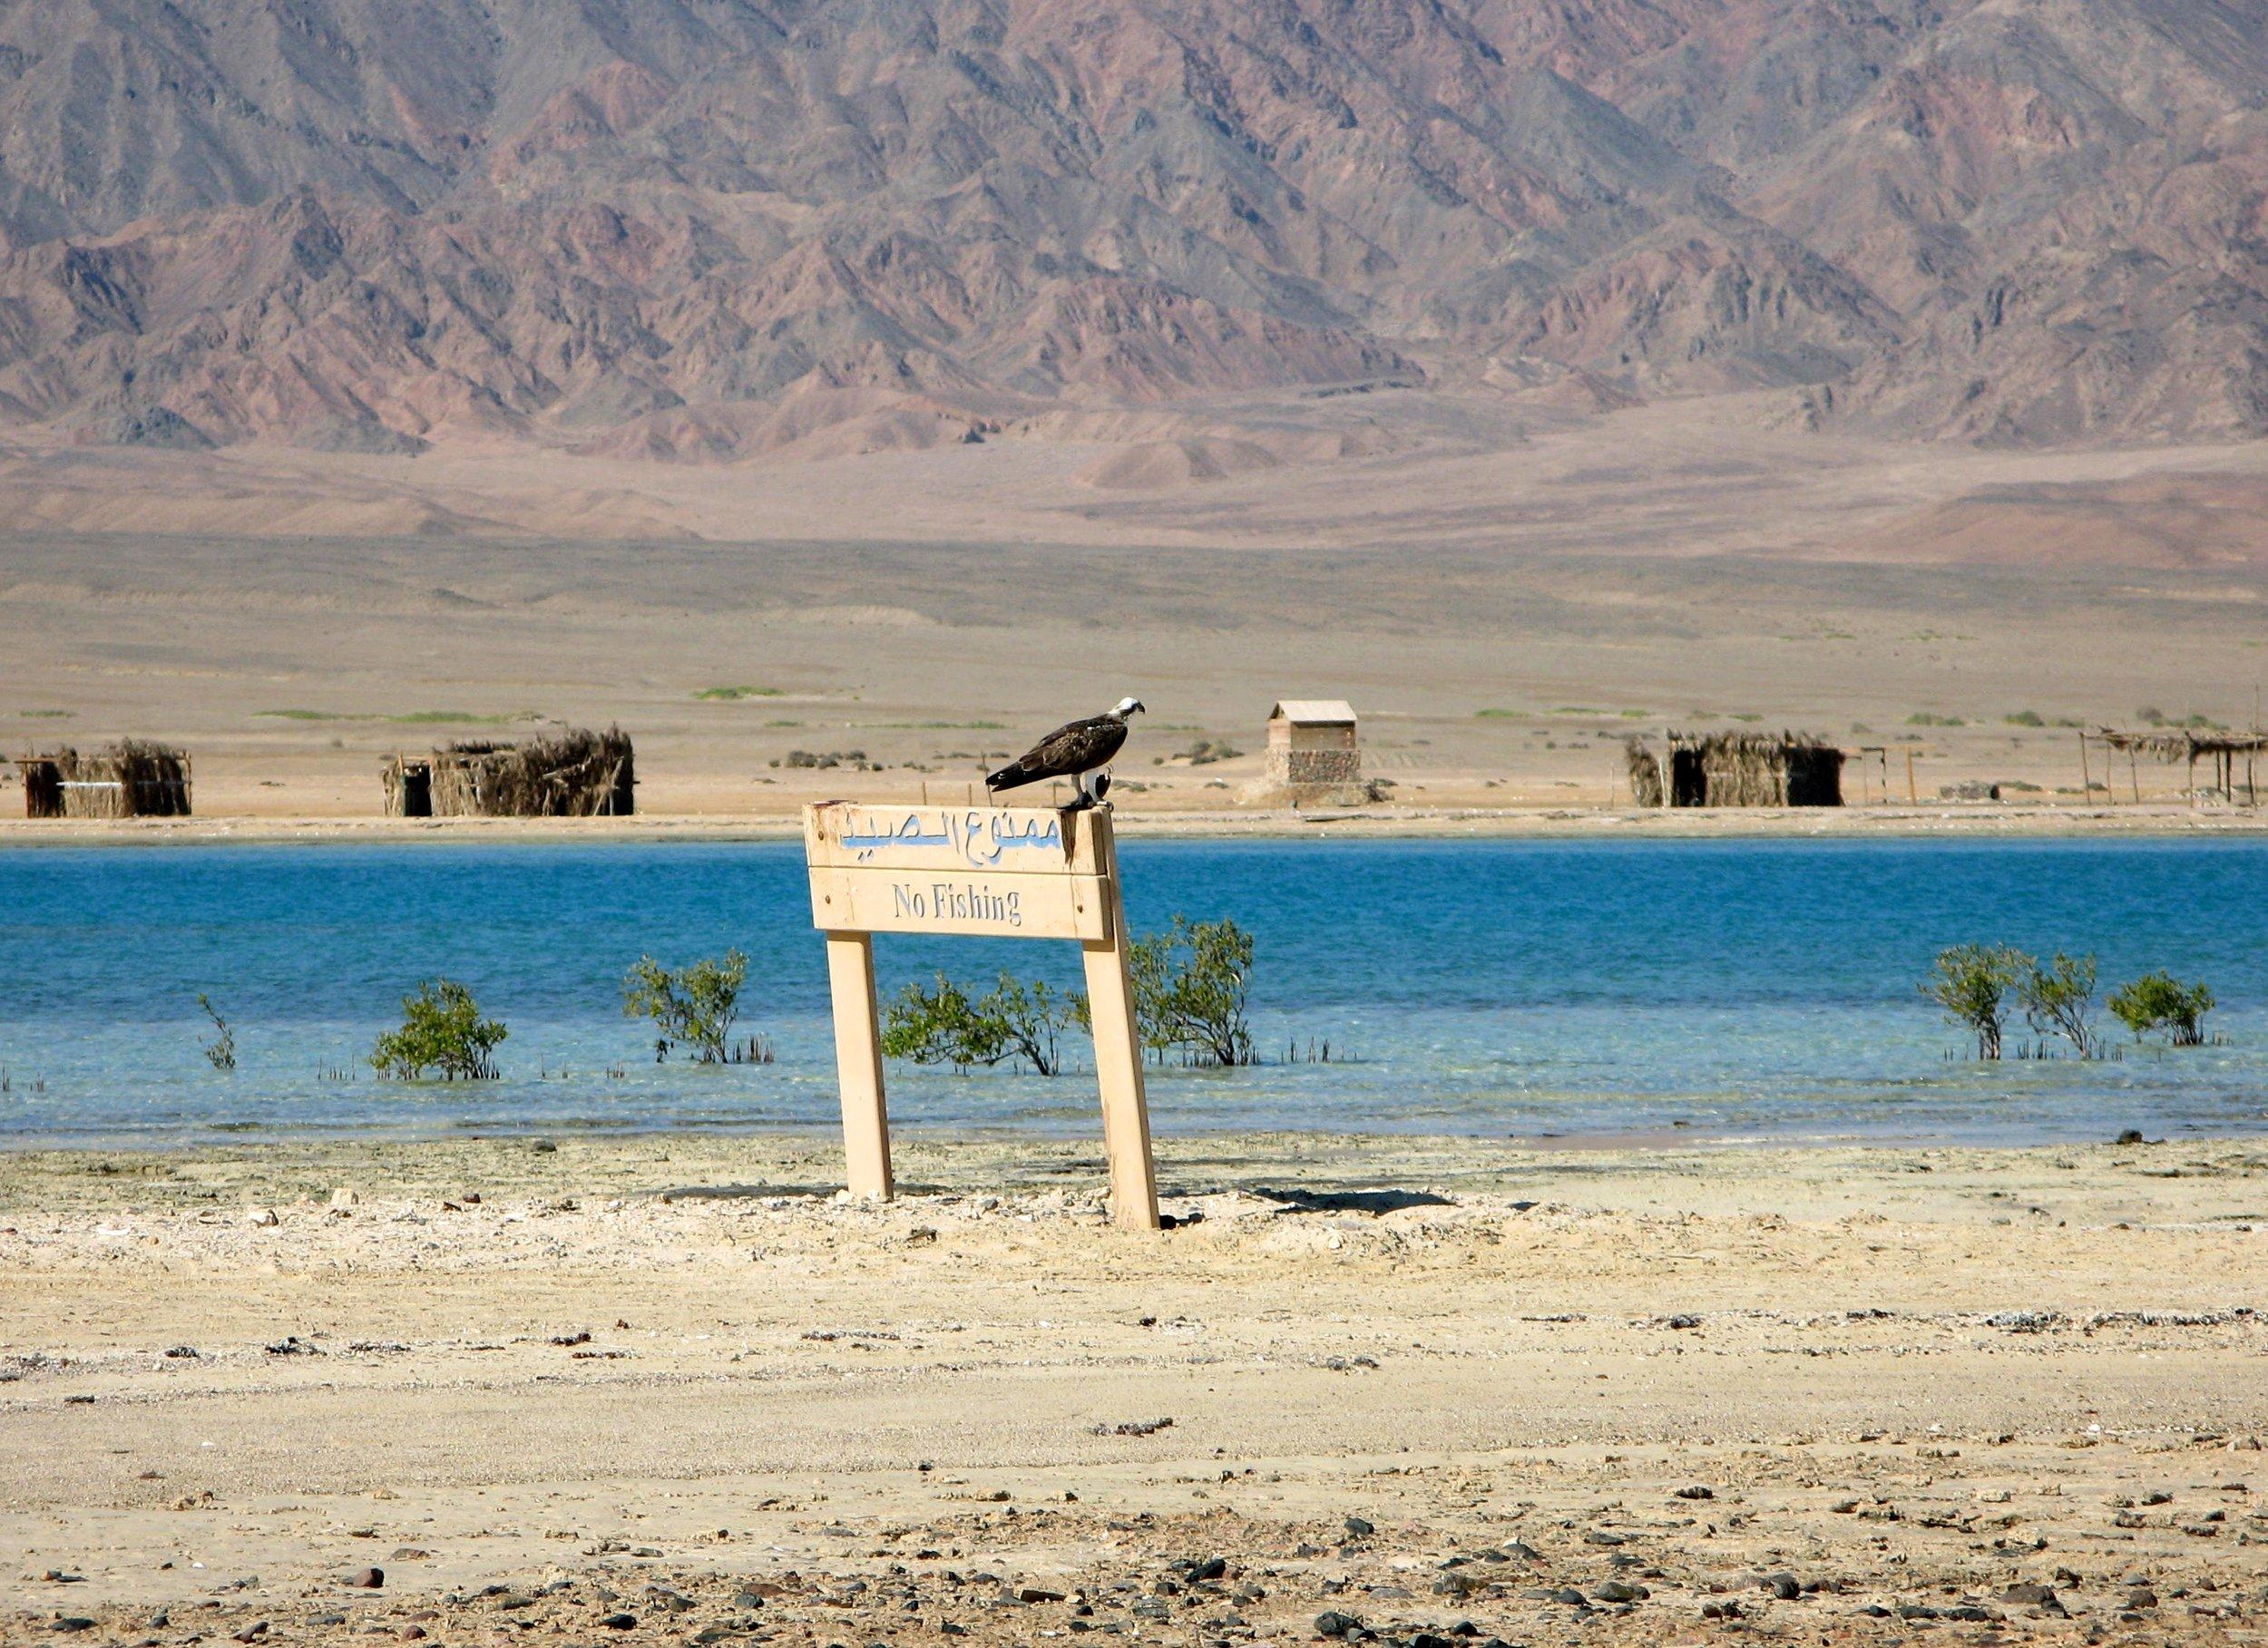 Dahab_trips_excursions_Red Sea_Egypt_Sinai_Nabq_Osprey - Kopi.JPG